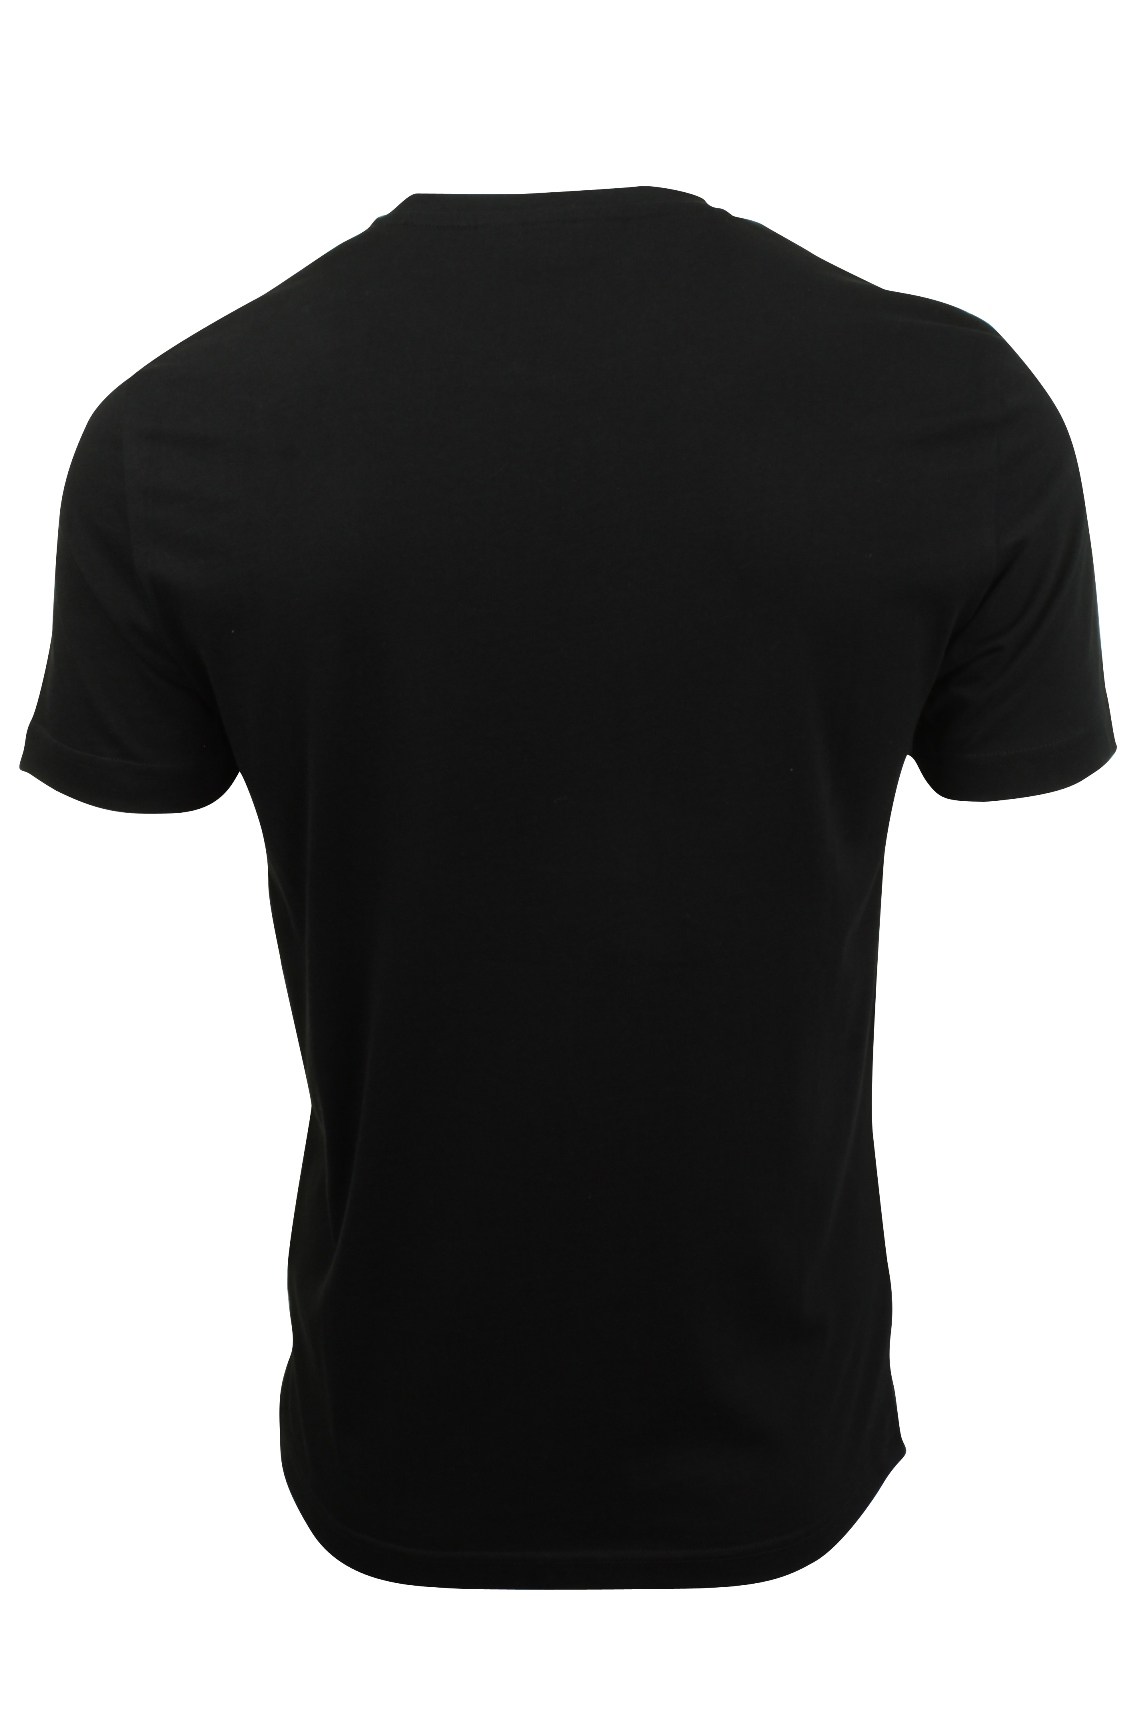 Mens-T-Shirt-by-Original-Penguin-Crew-Neck-Short-Sleeved thumbnail 53